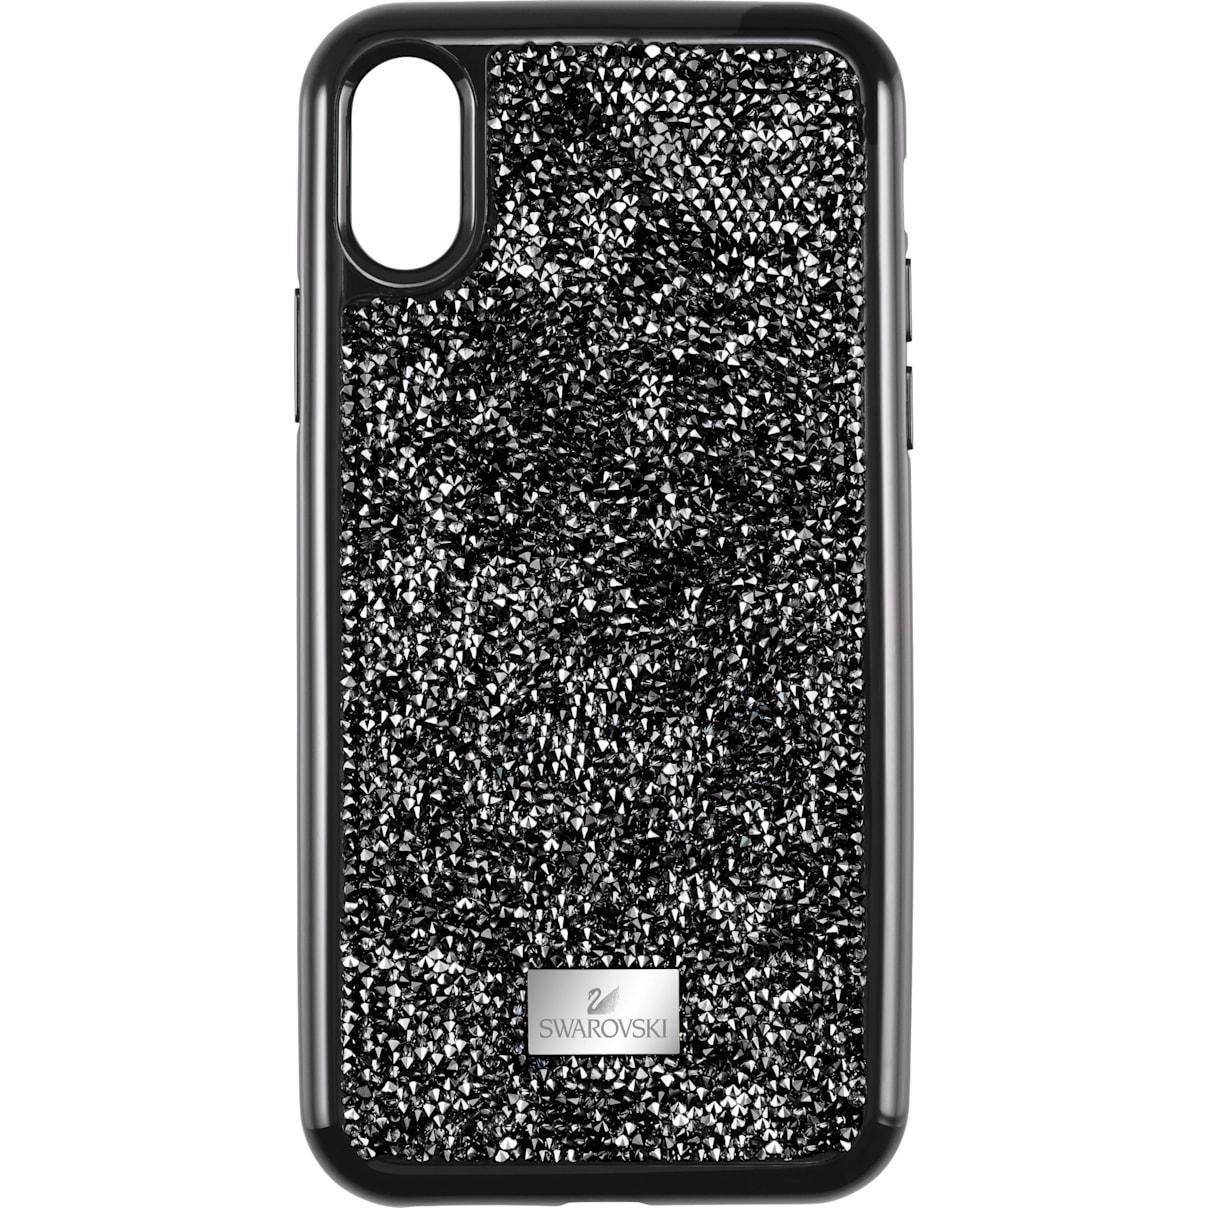 Swarovski Glam Rock Smartphone Case with Bumper, iPhone® XR, Black